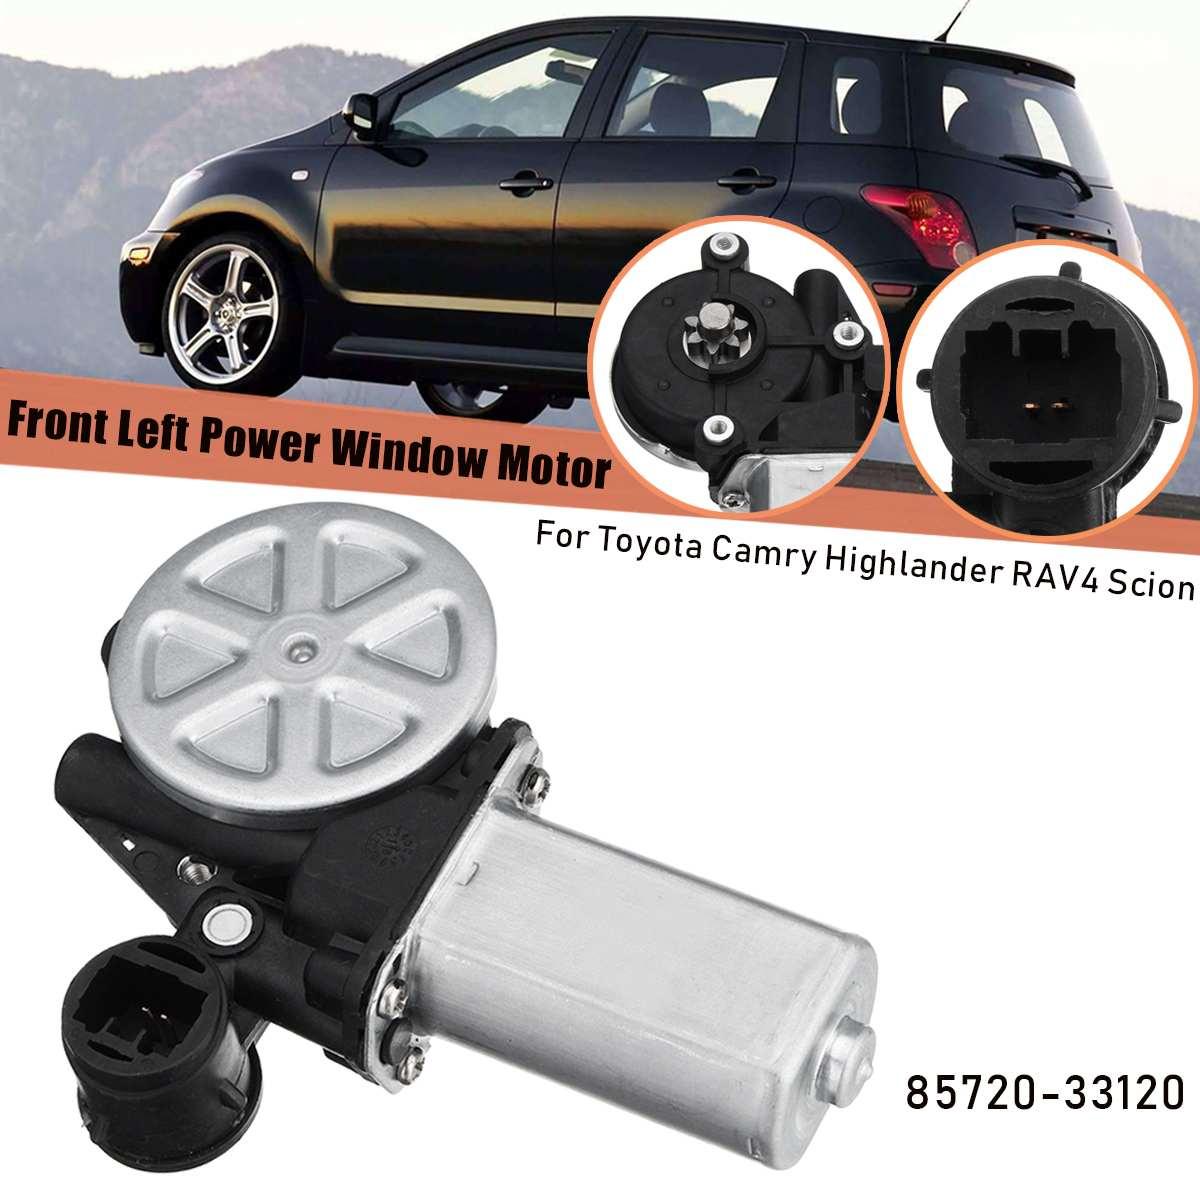 Front Left Power Window Motor Fits 47-10009 Toyota Highlander RAV4 Camry Scion